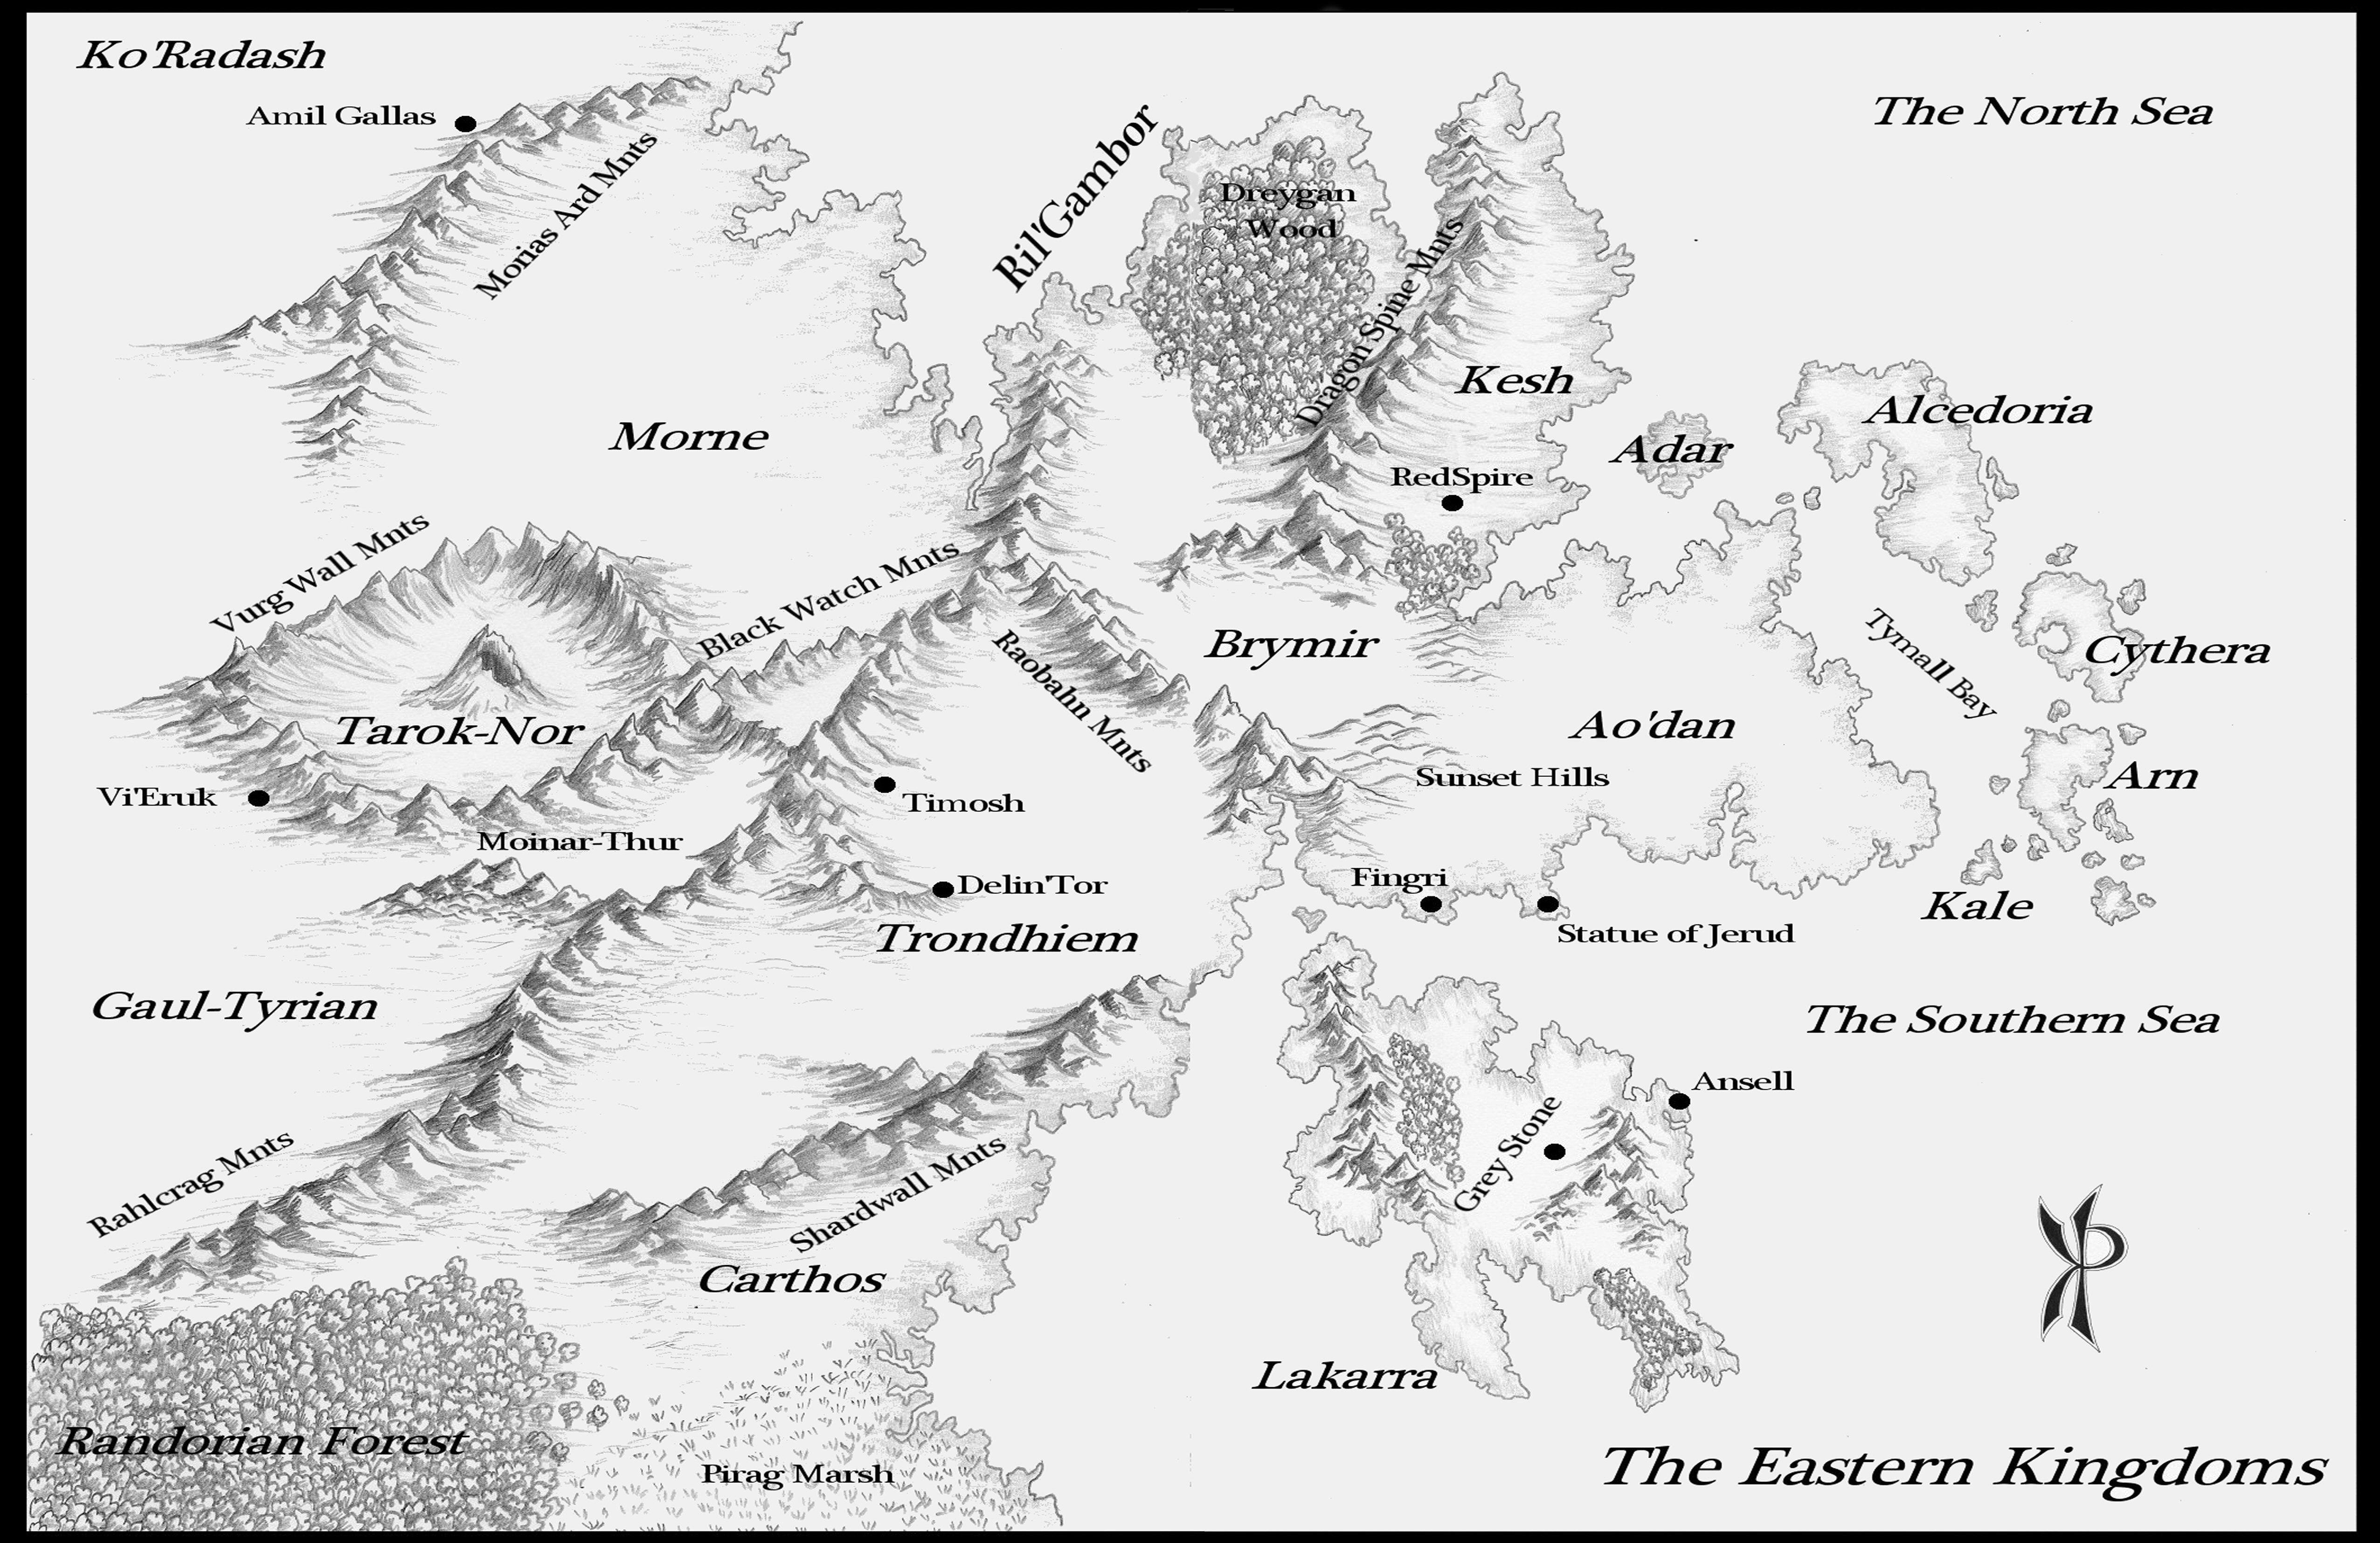 The Eastern Kingdoms